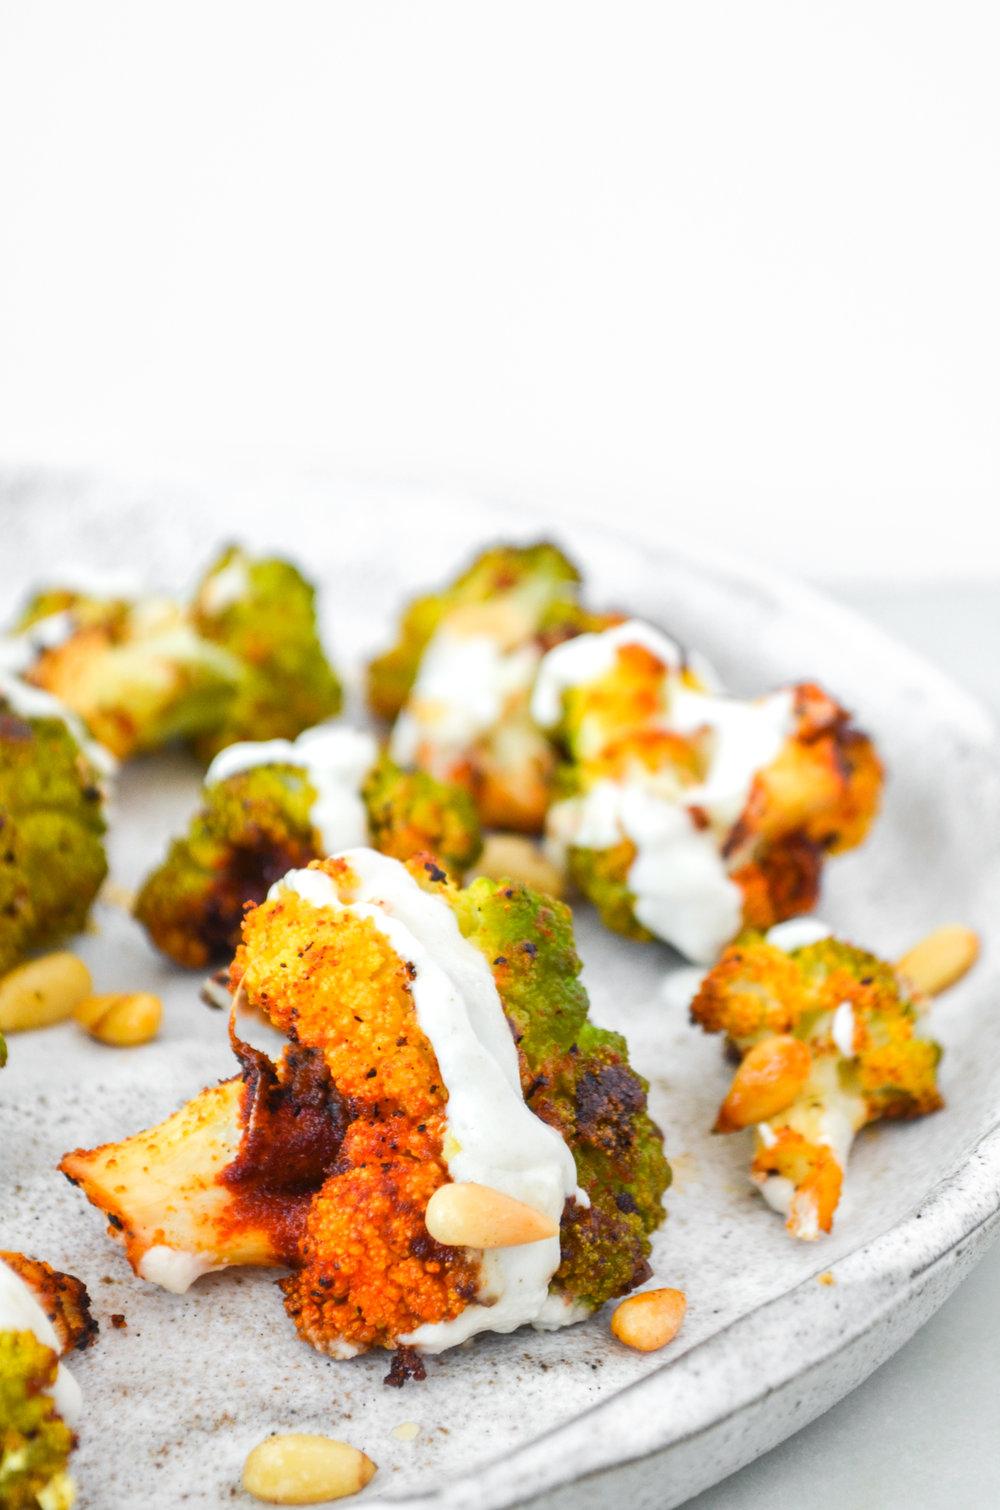 paleo-roasted-broccoflower-ShiraRD-paleo-refinedsugarfree-SnacksbyShira.jpg